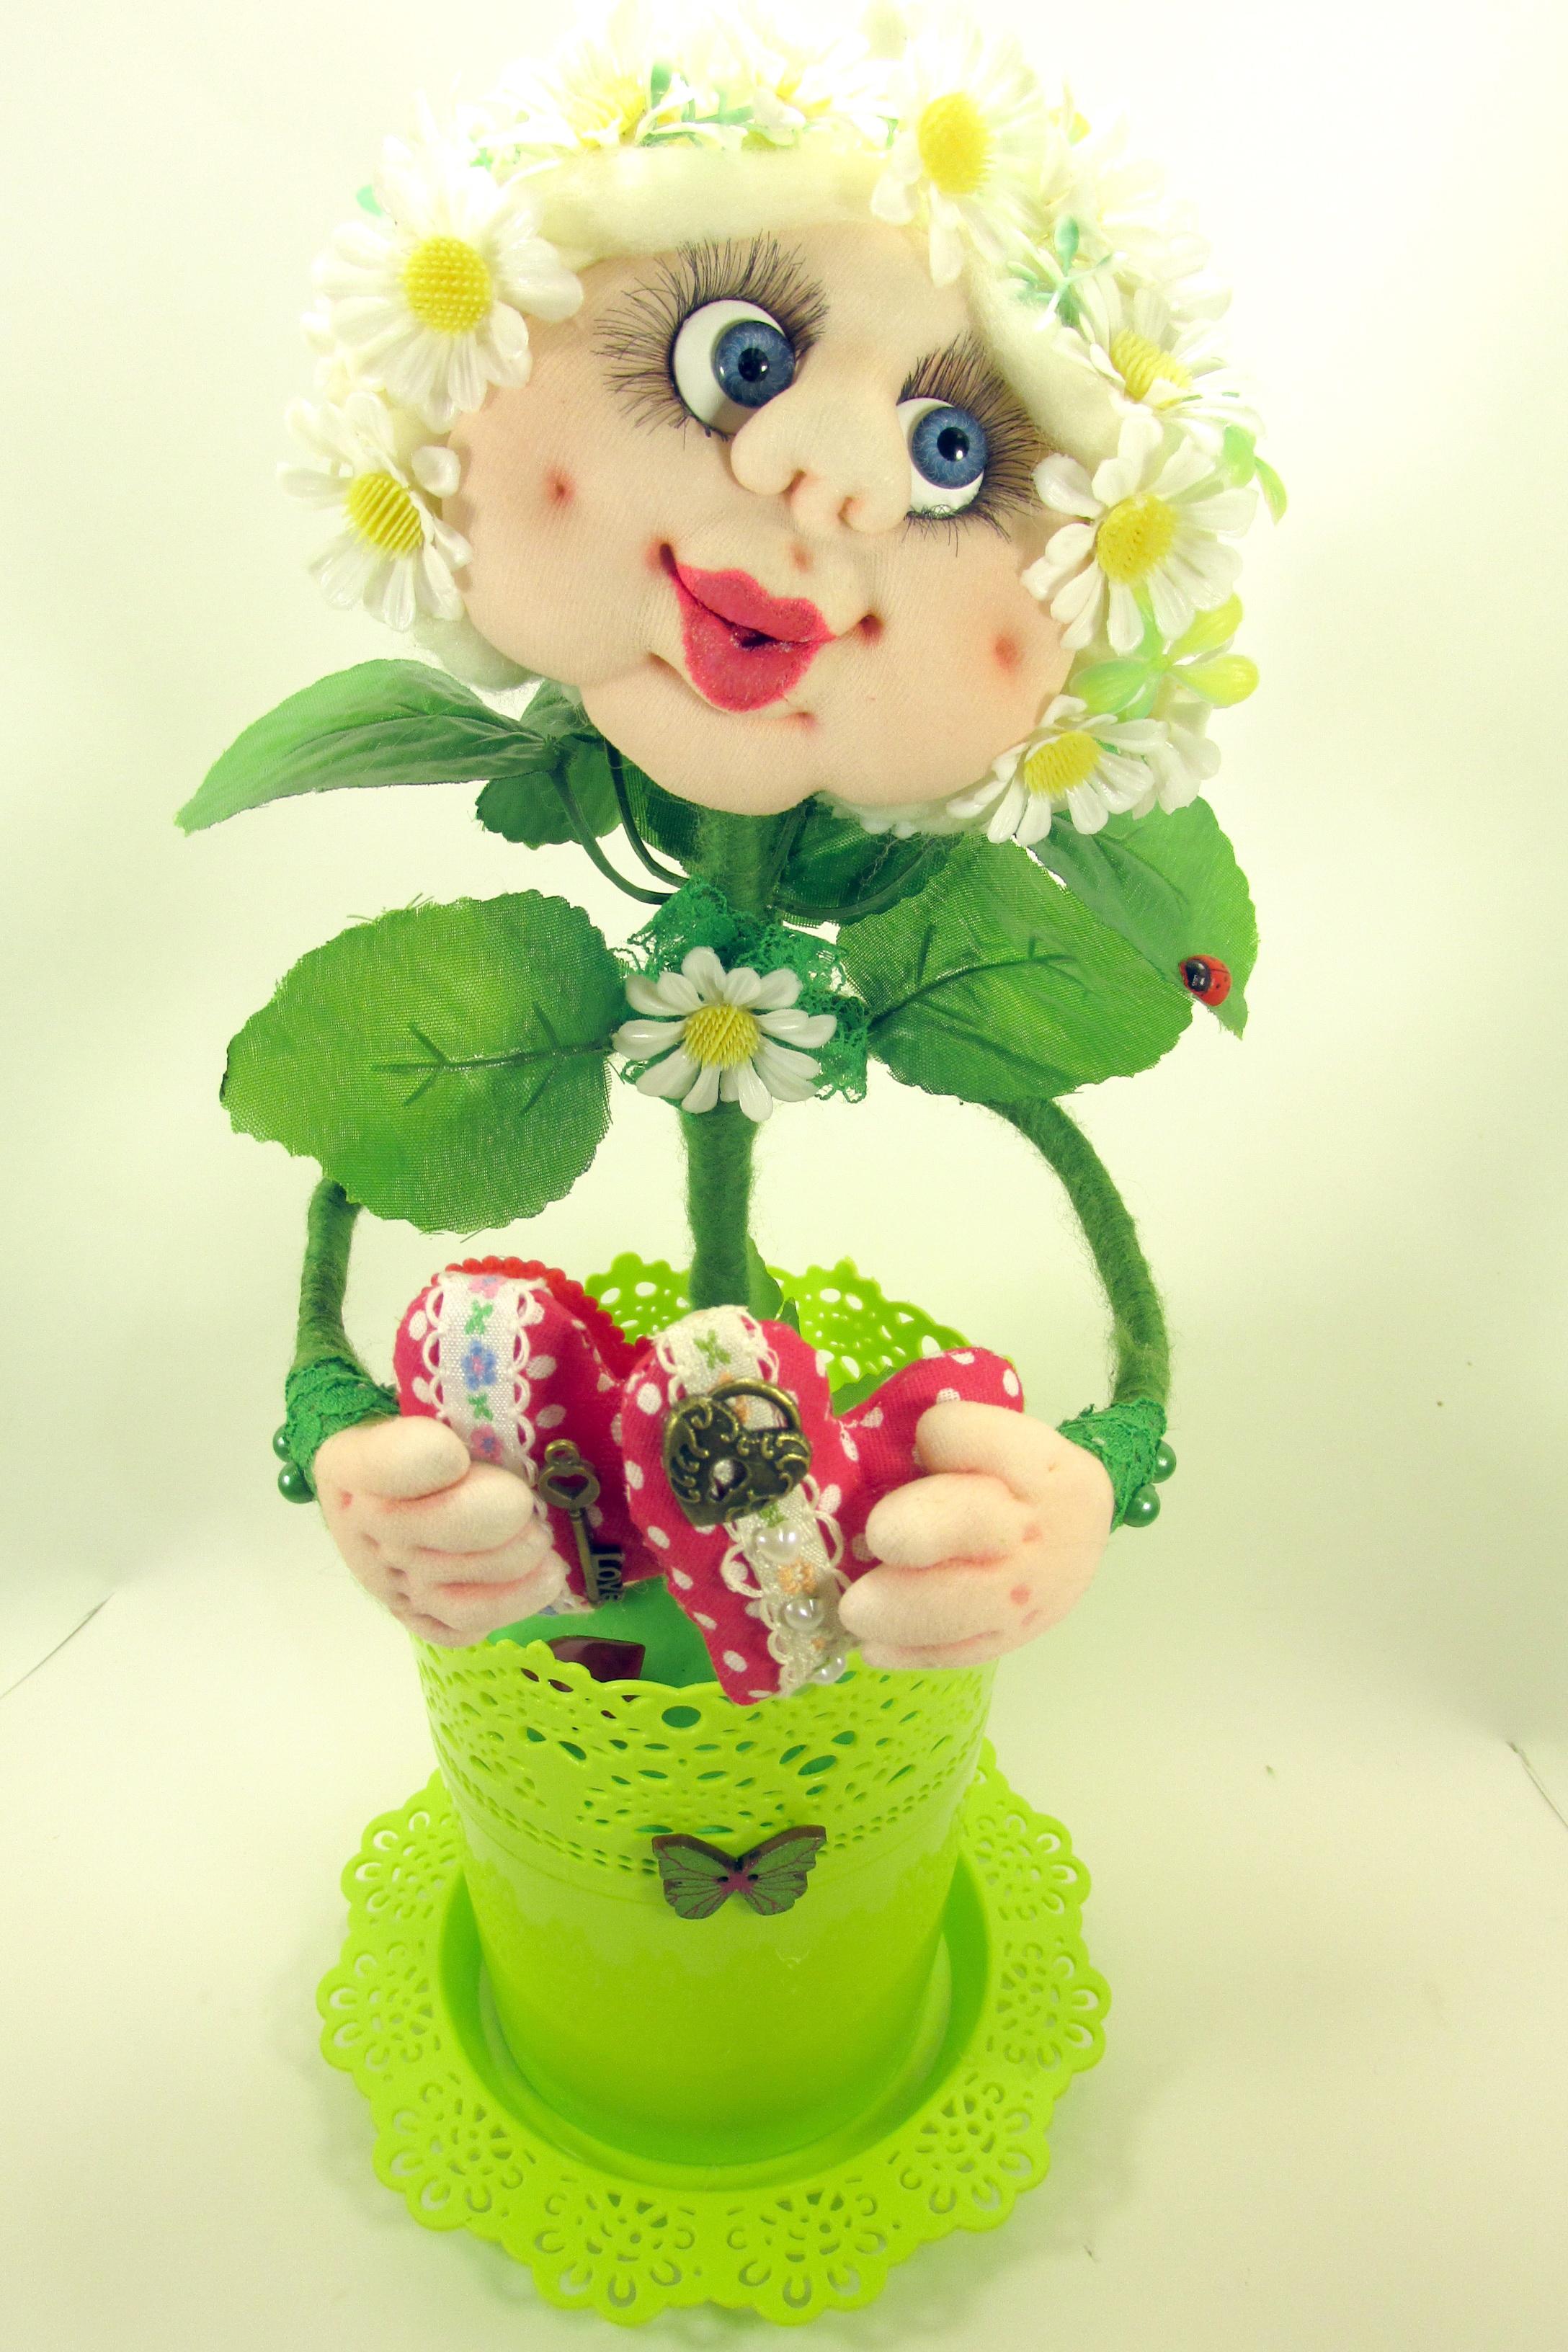 Цветок в чулочной технике, мастер - класс с фото, пошагово